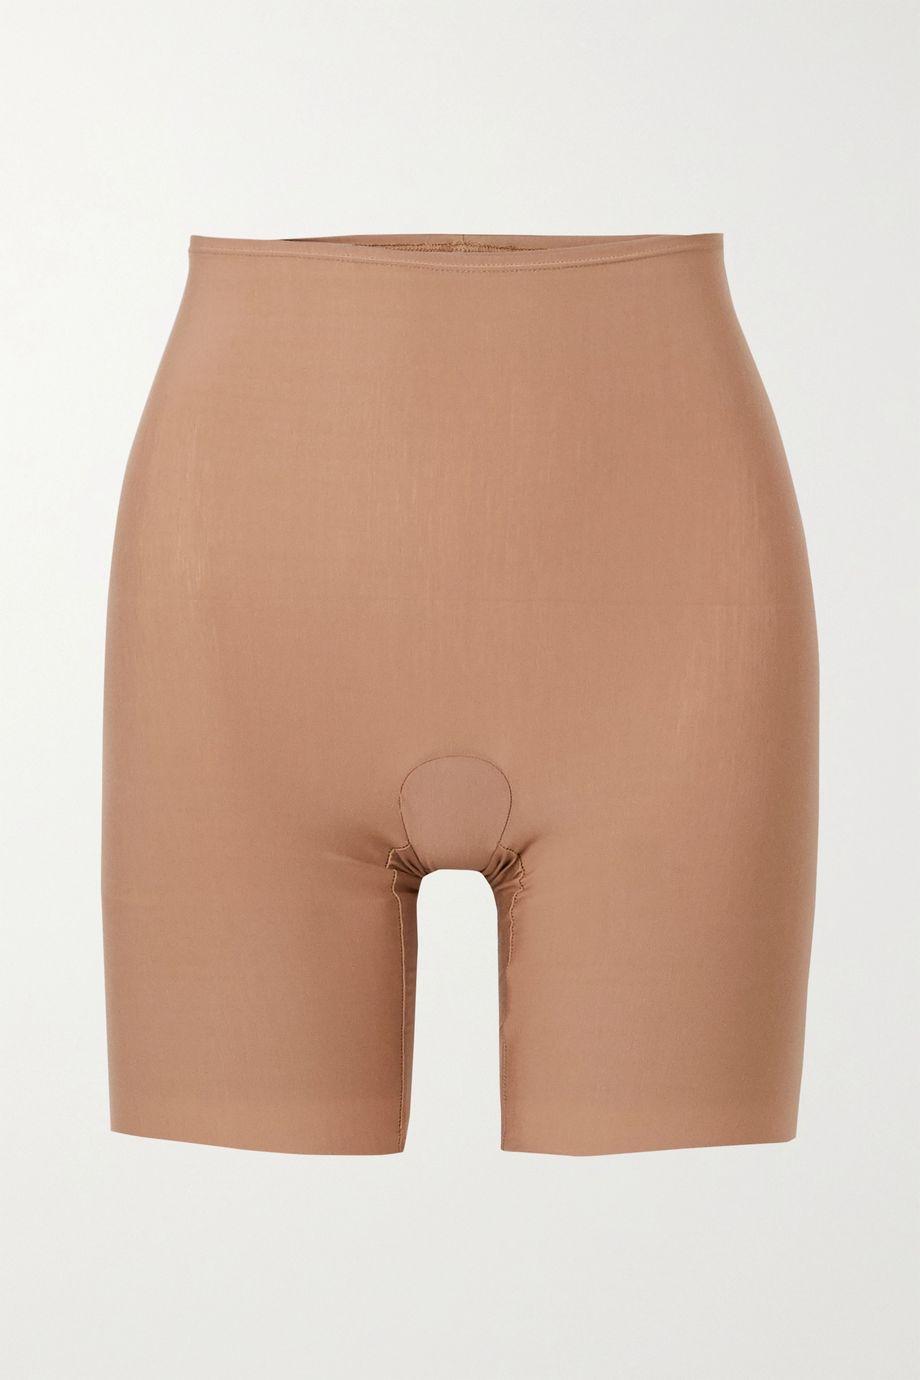 Commando Butter Control stretch-modal shorts